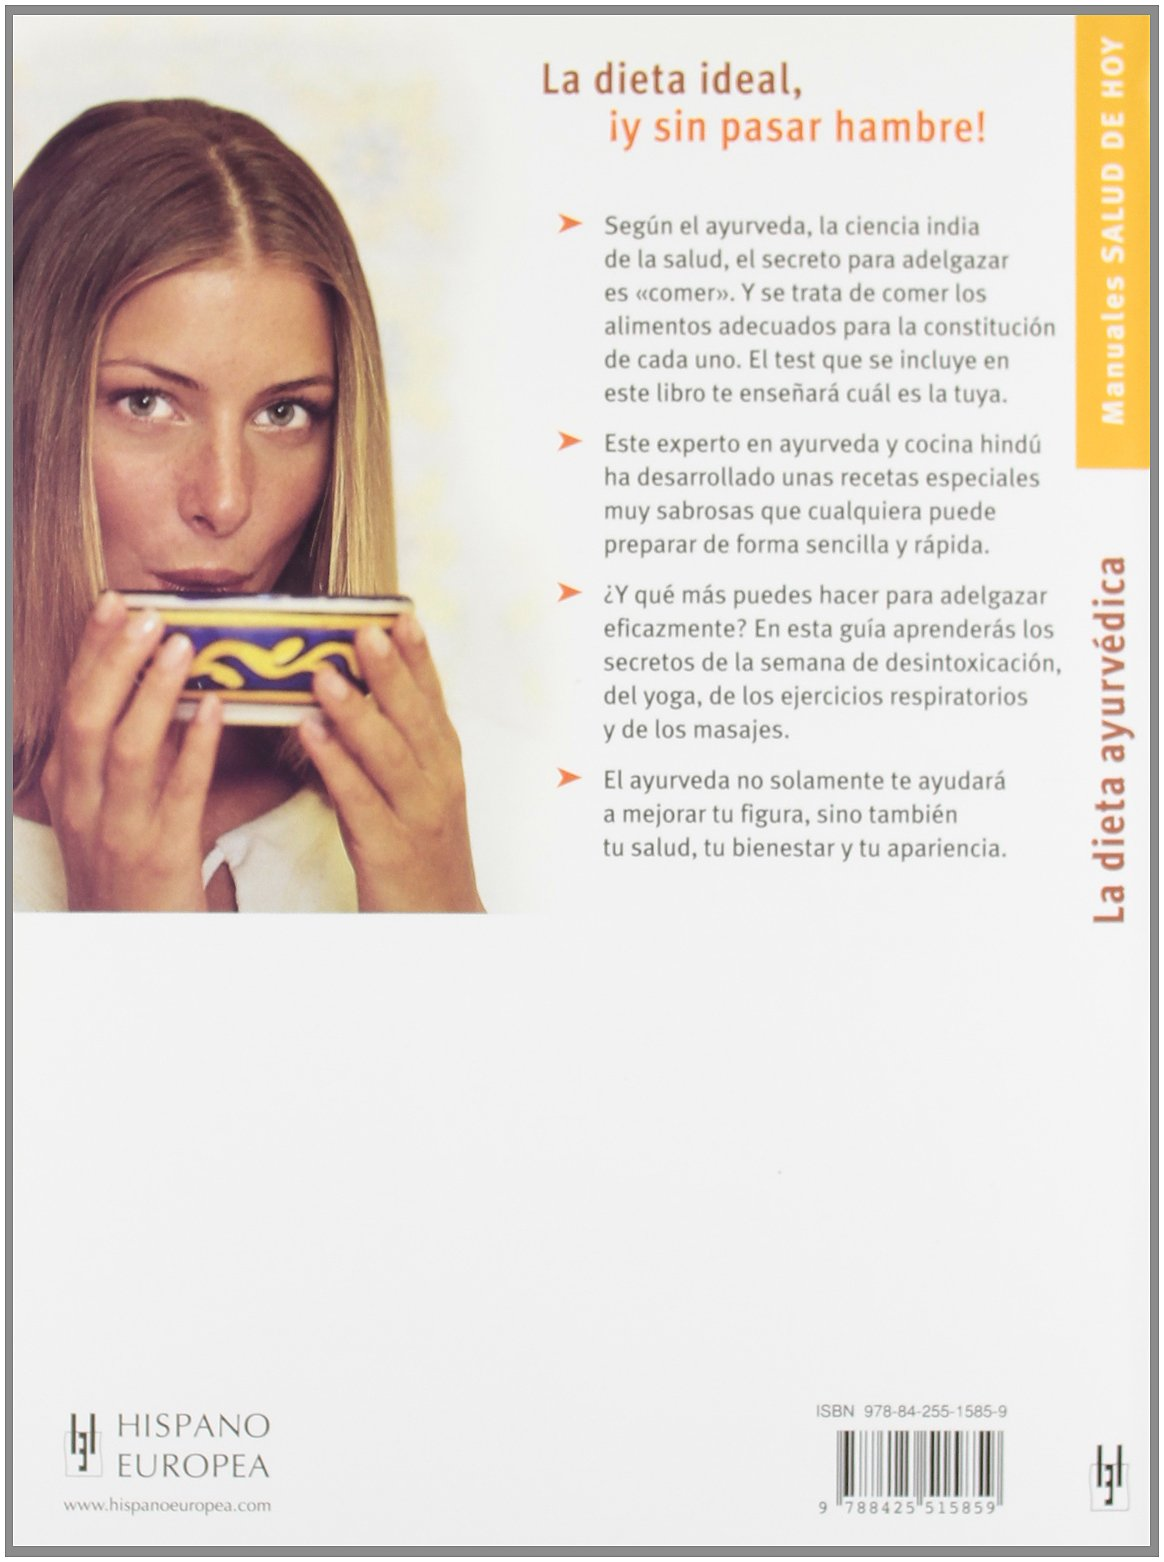 Ayurveda dietas para adelgazar